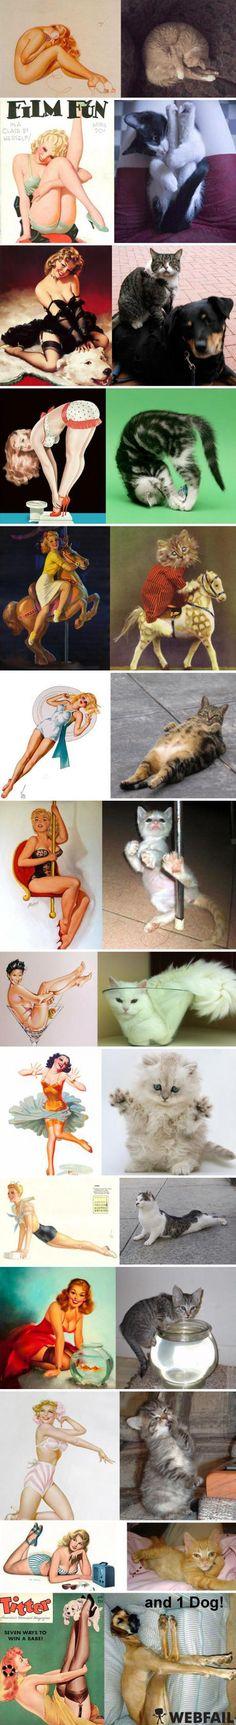 Pin-Up Girls vs. Pin-Up Cats - Win Bild - Webfail